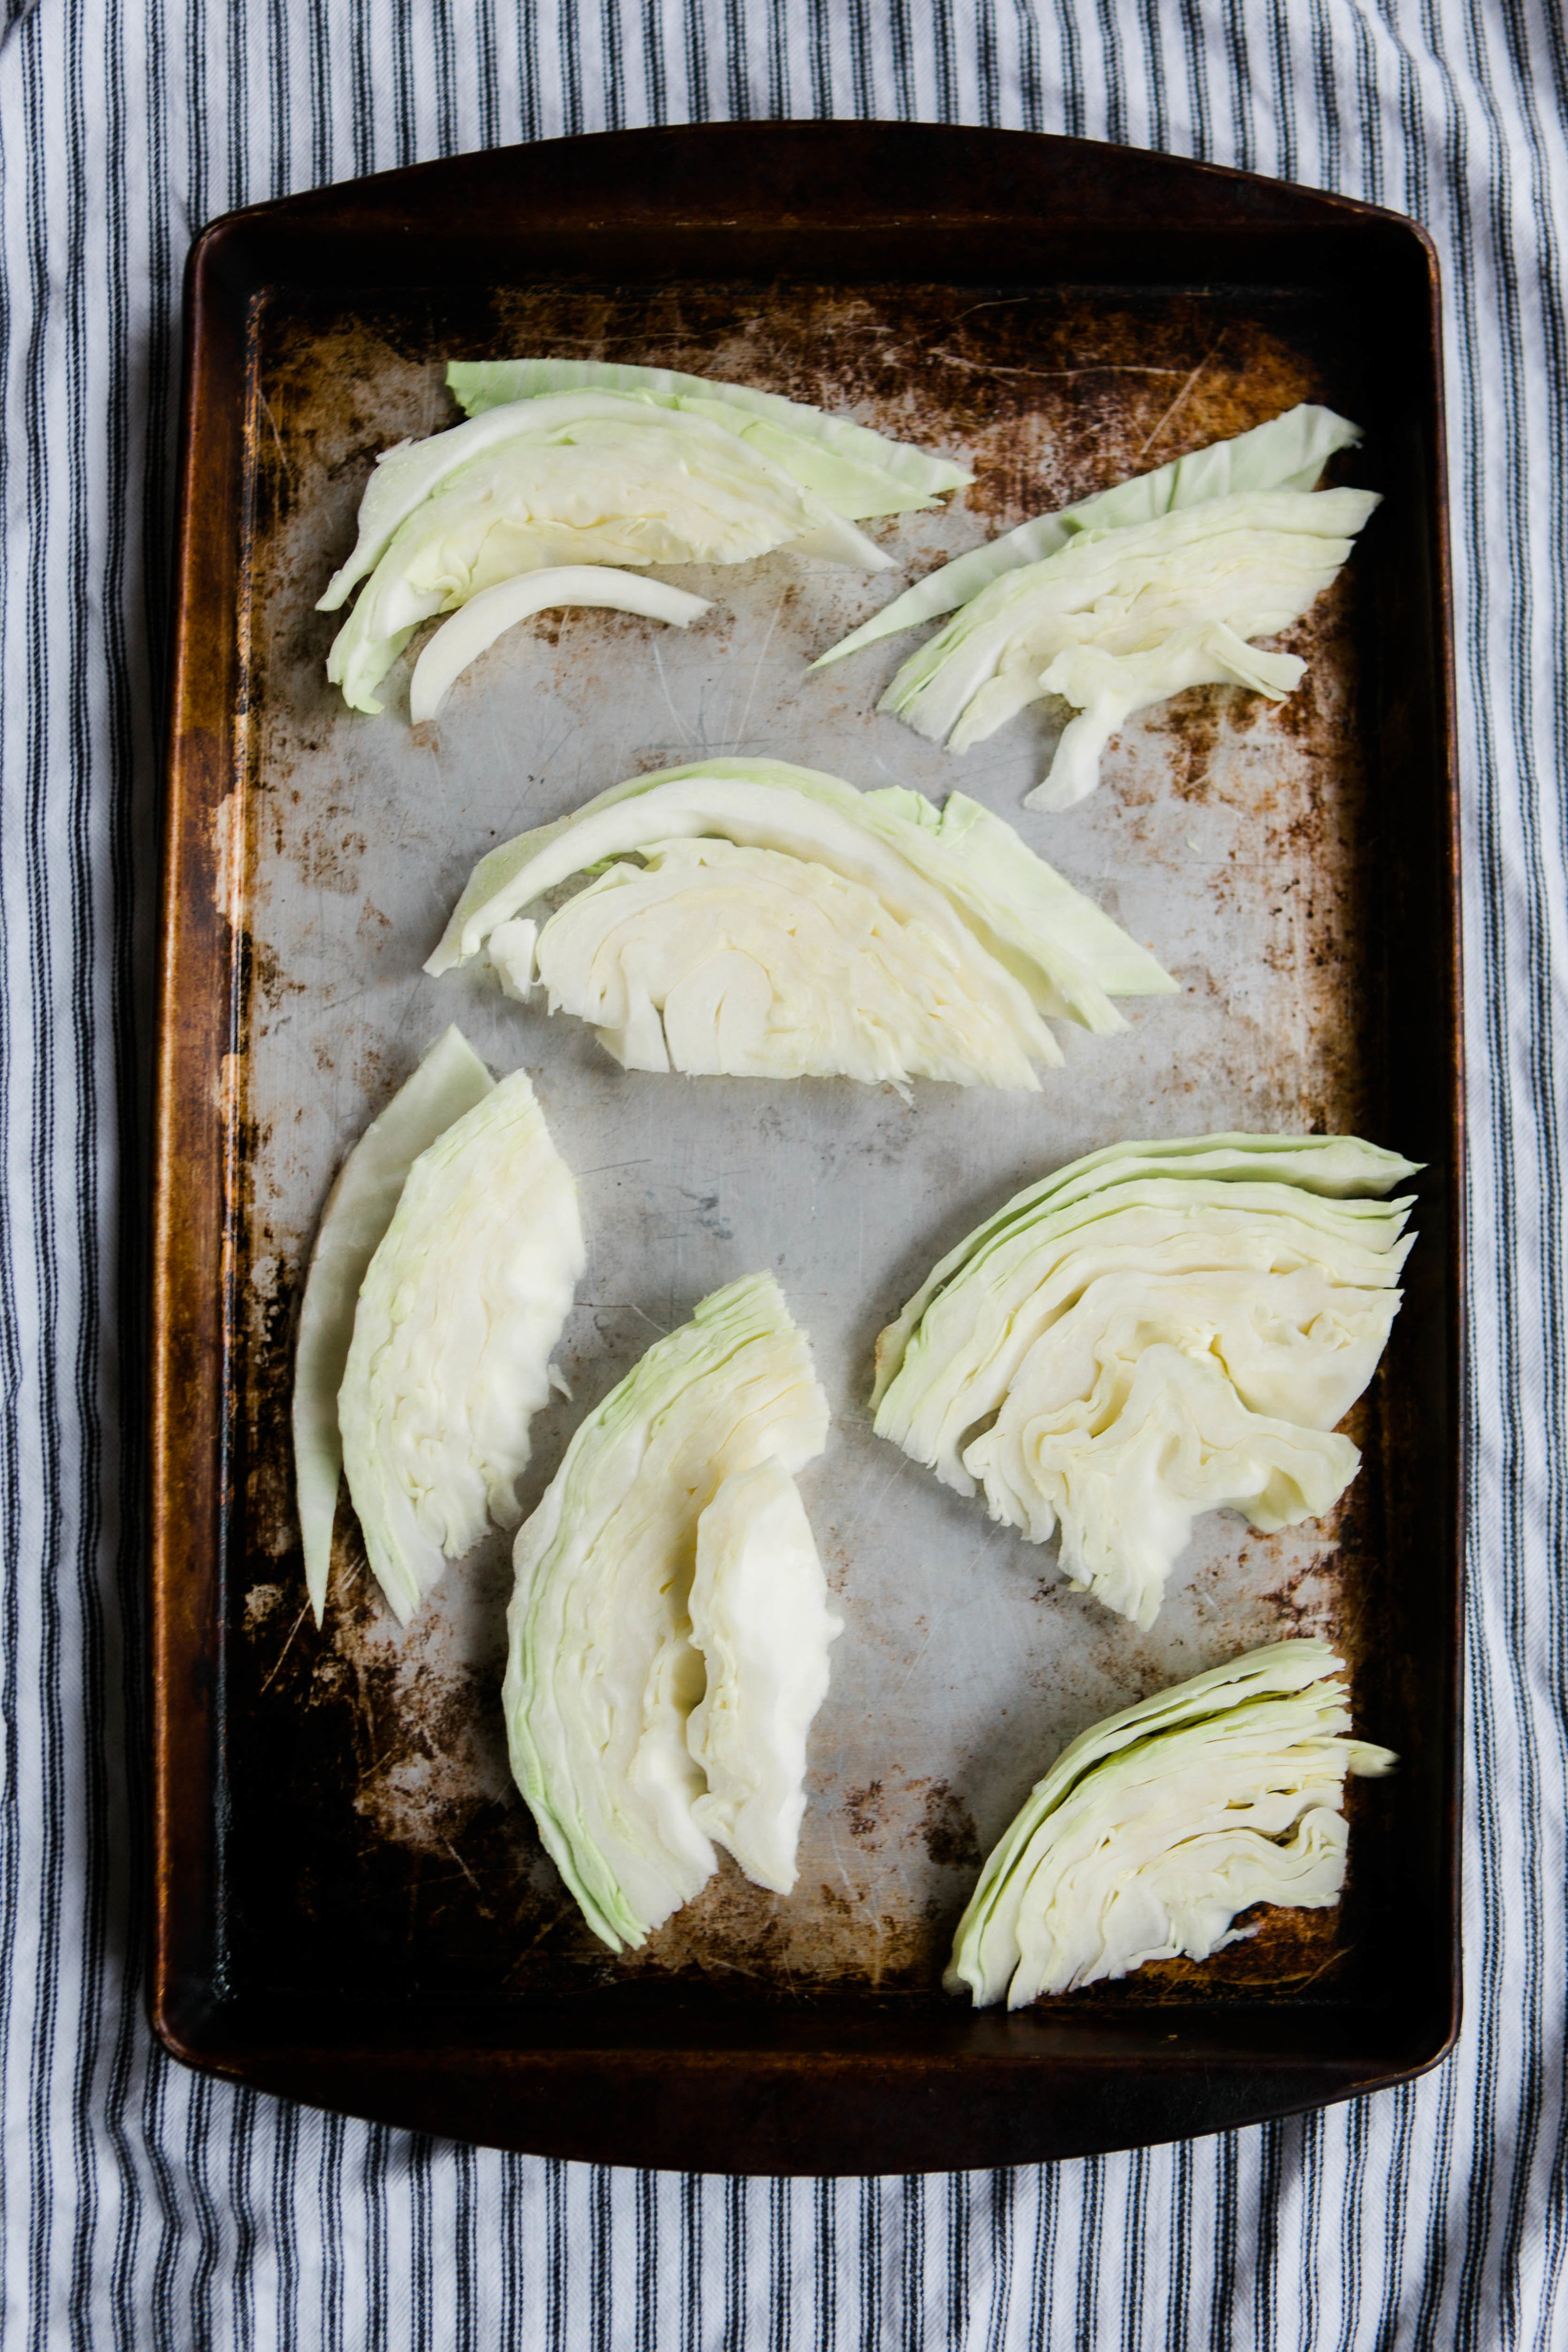 jennahazelphotography-cabbage-with-honey-mustard-0228.jpg